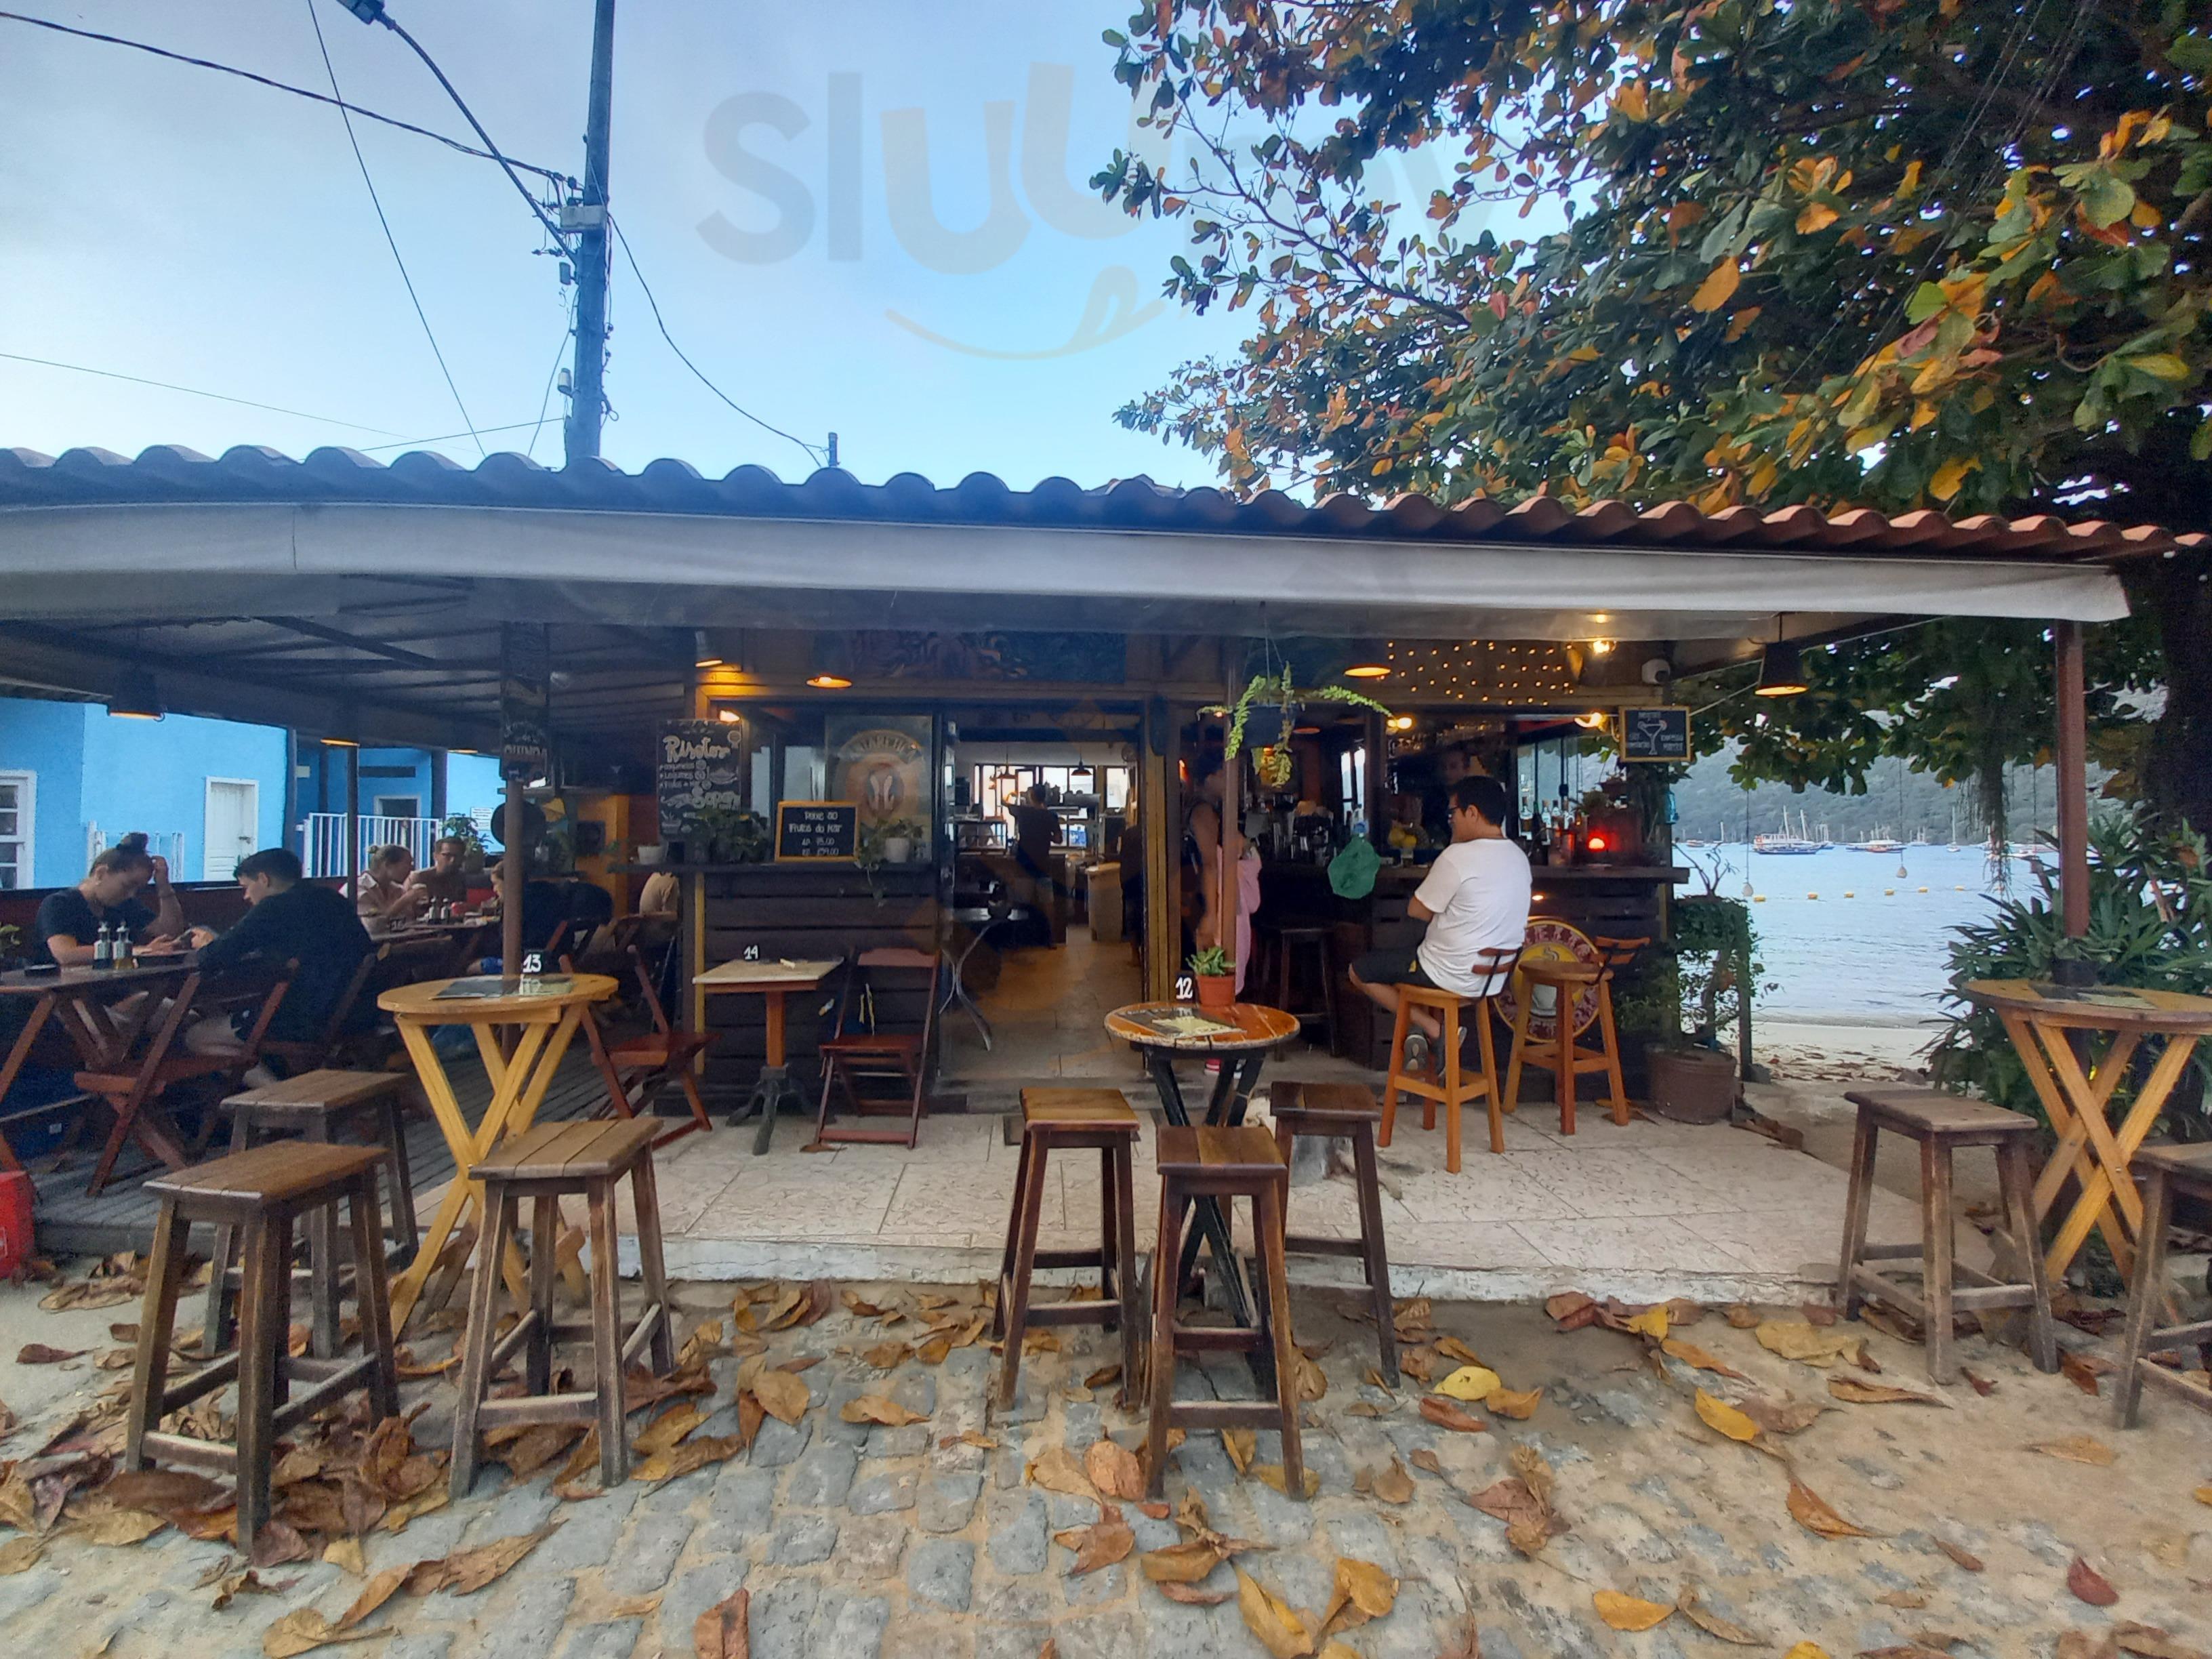 Ateliê Cafeteria, Angra dos Reis